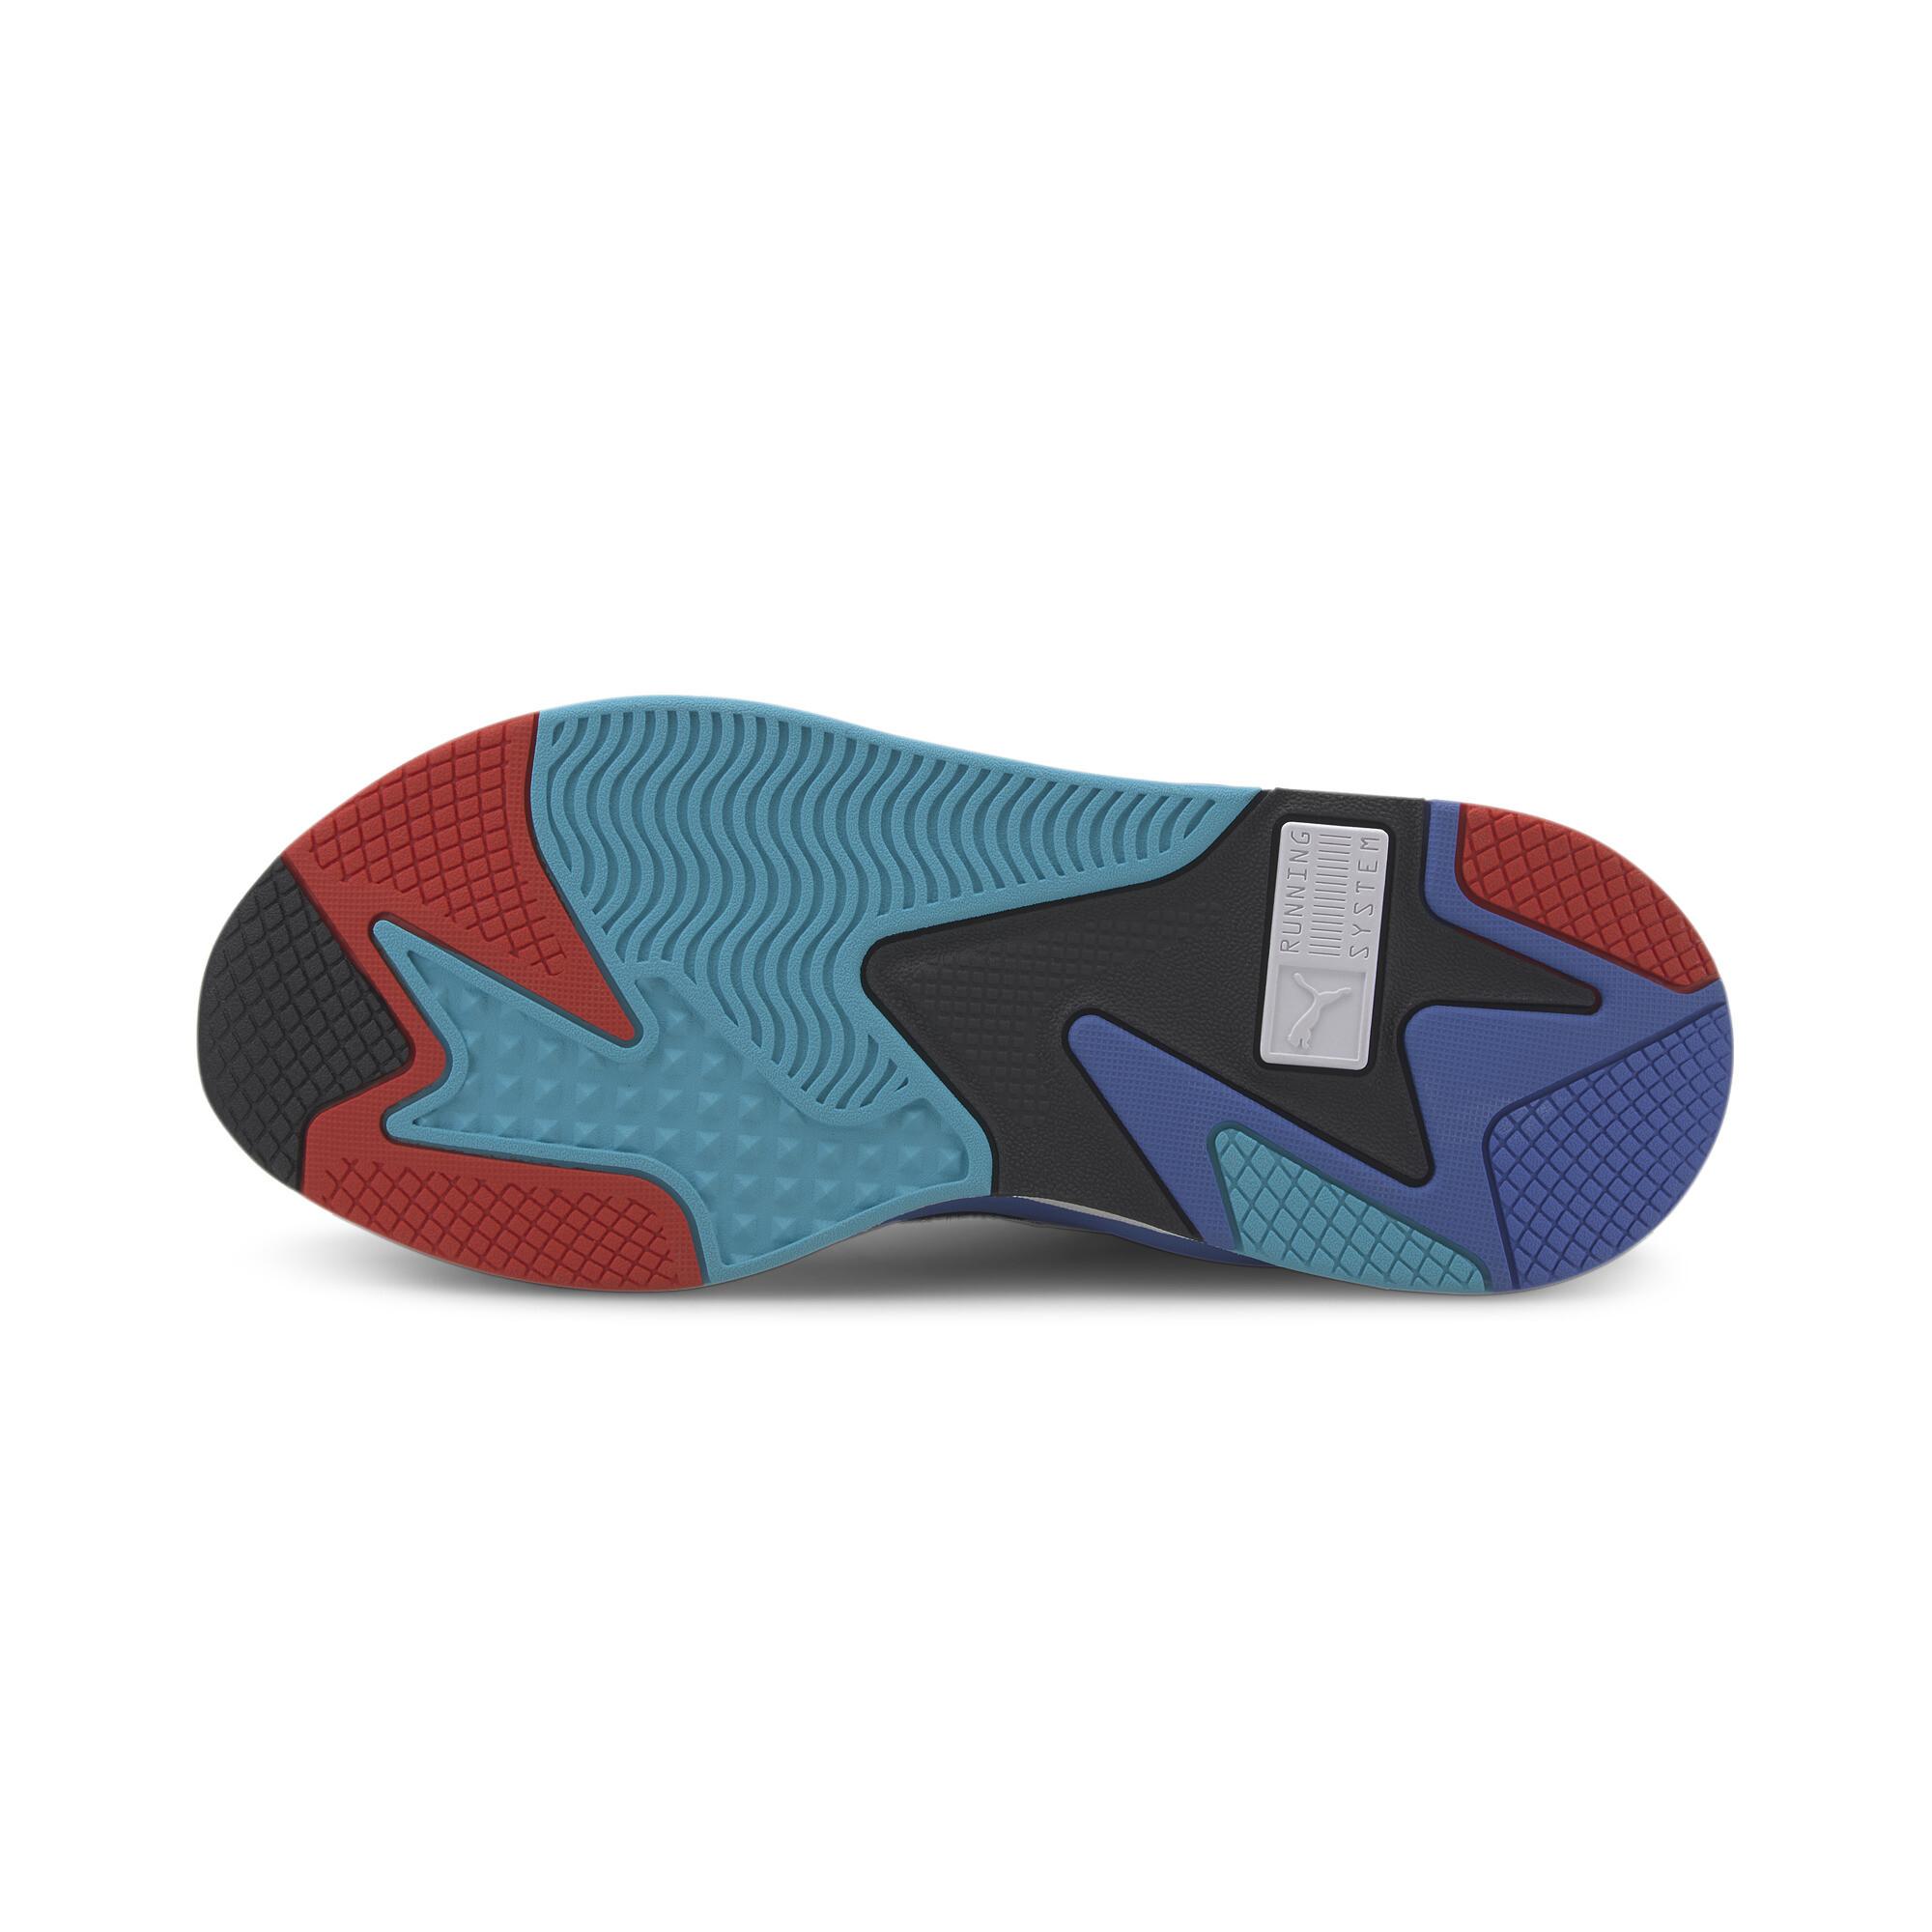 PUMA-Men-039-s-RS-X-Puzzle-Sneakers thumbnail 6